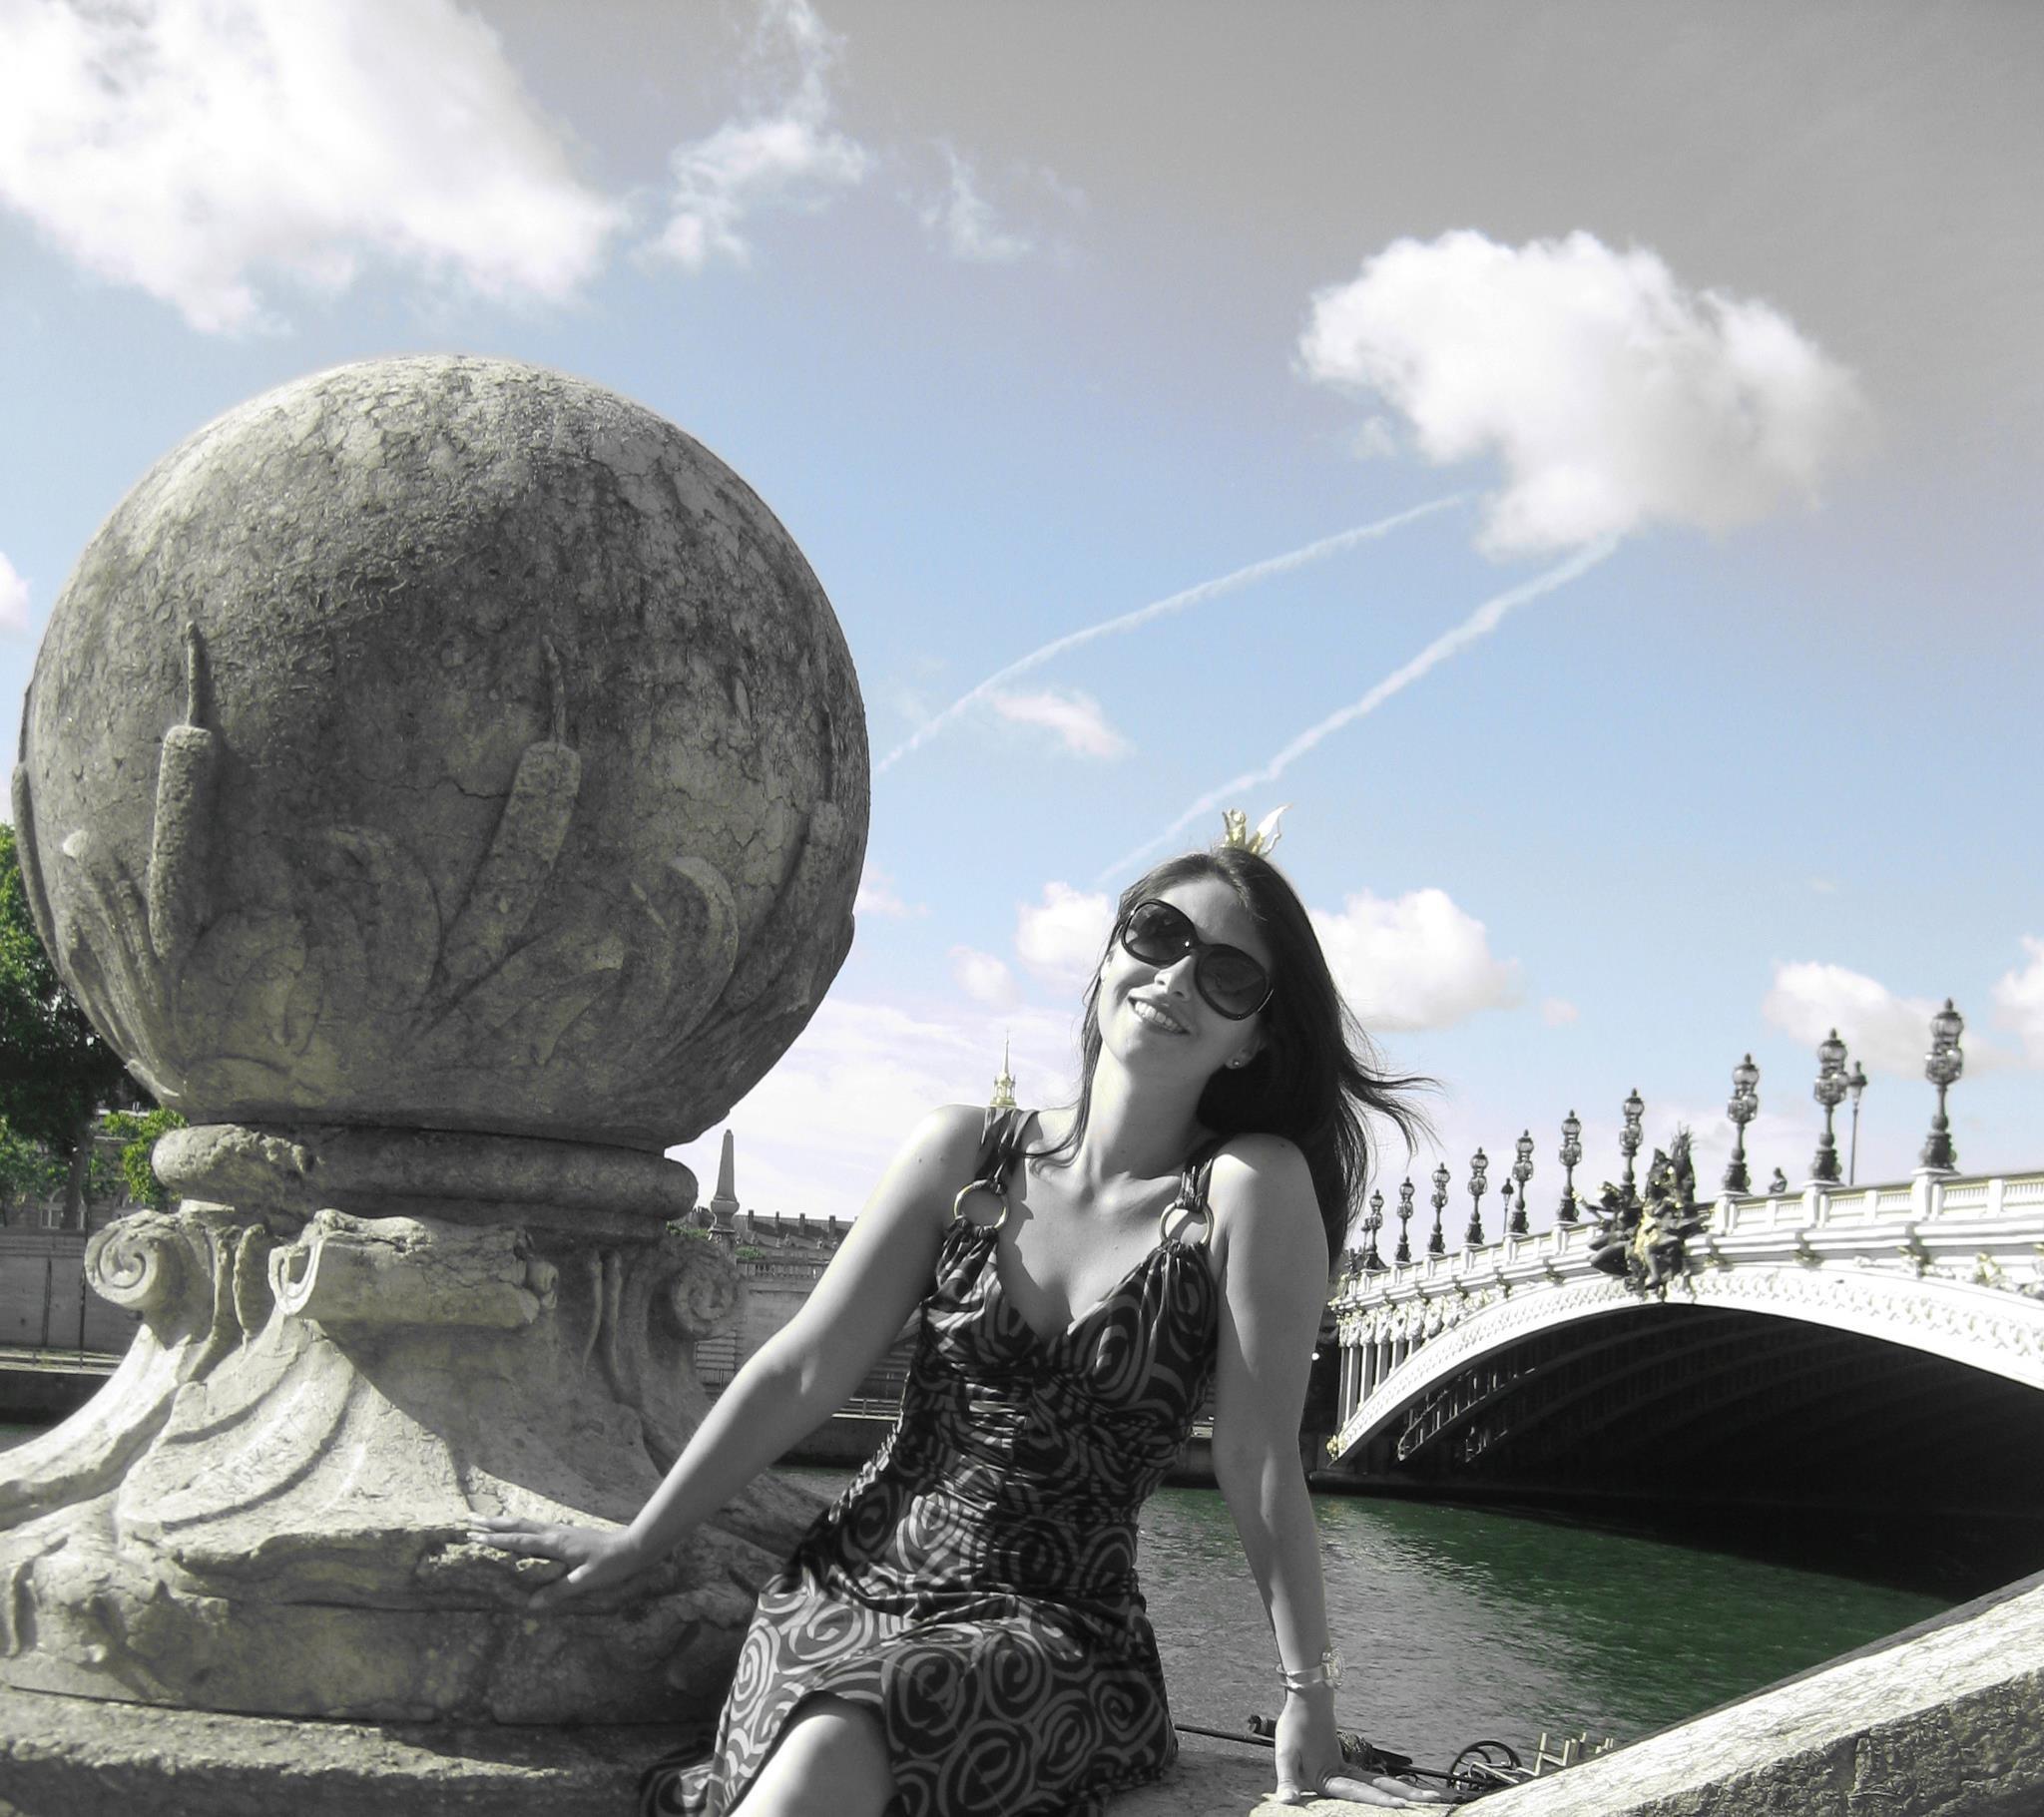 Paris by ceciliacarcamo